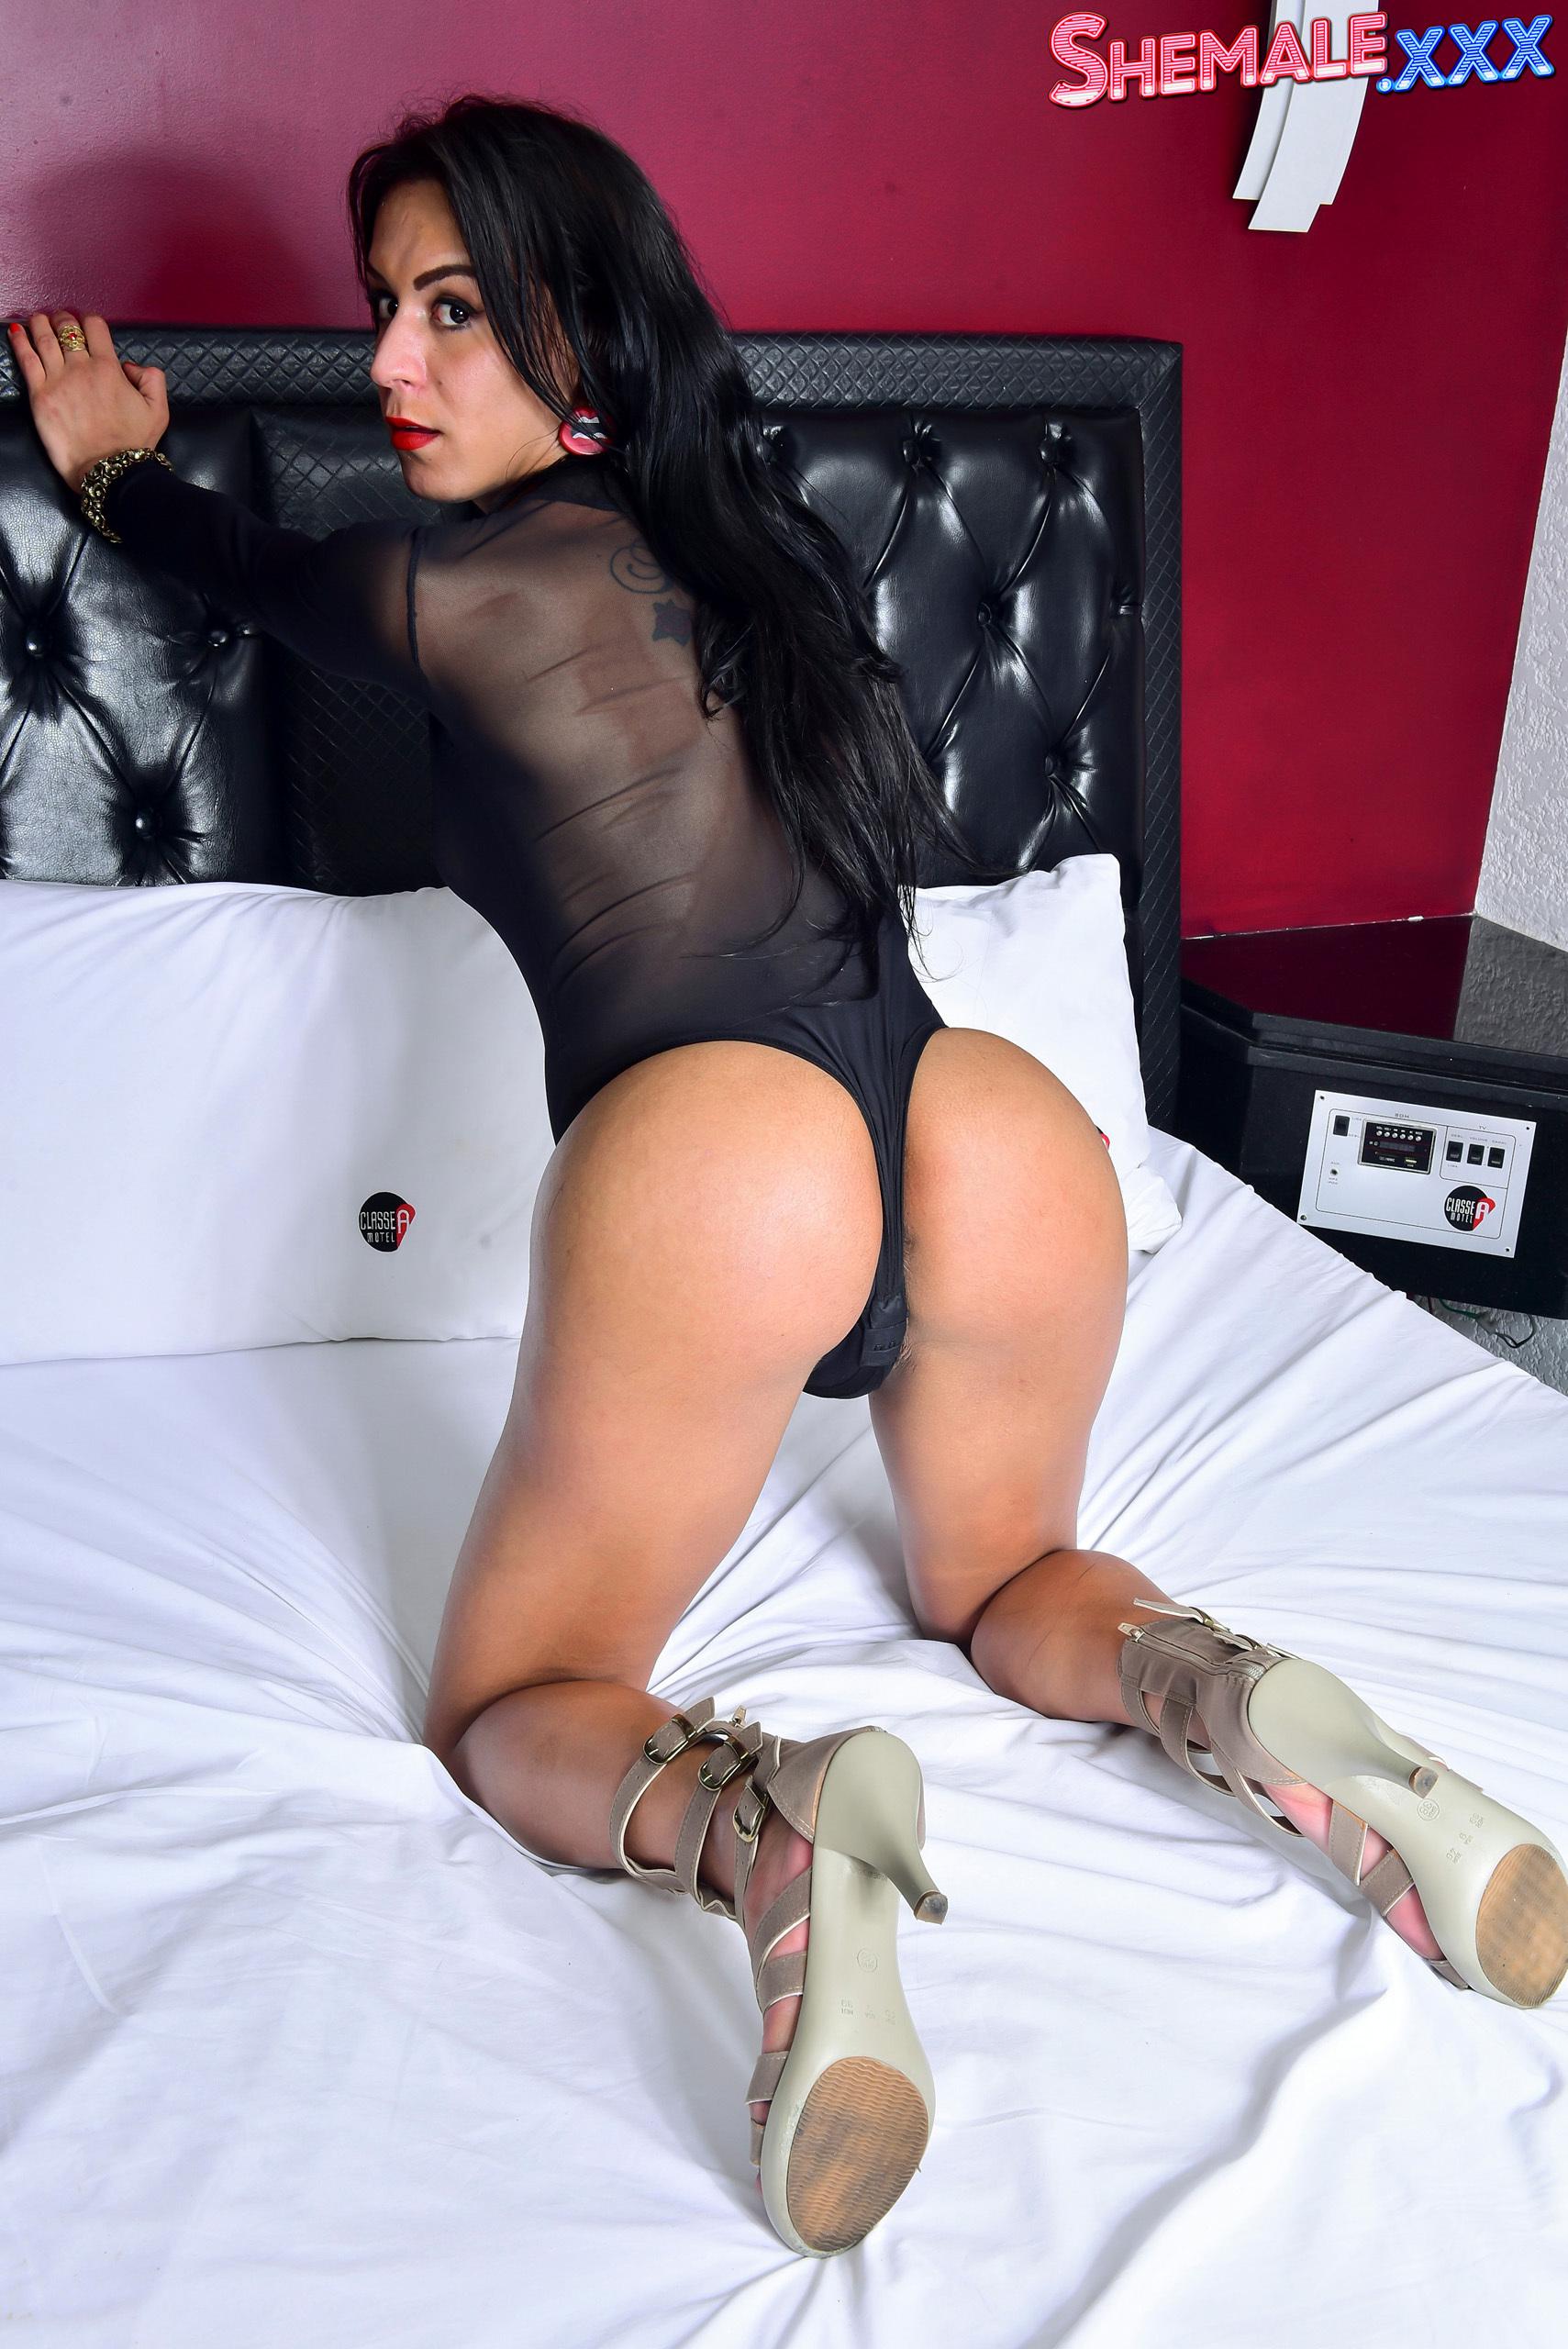 Larissa Stroke's On The Bed!